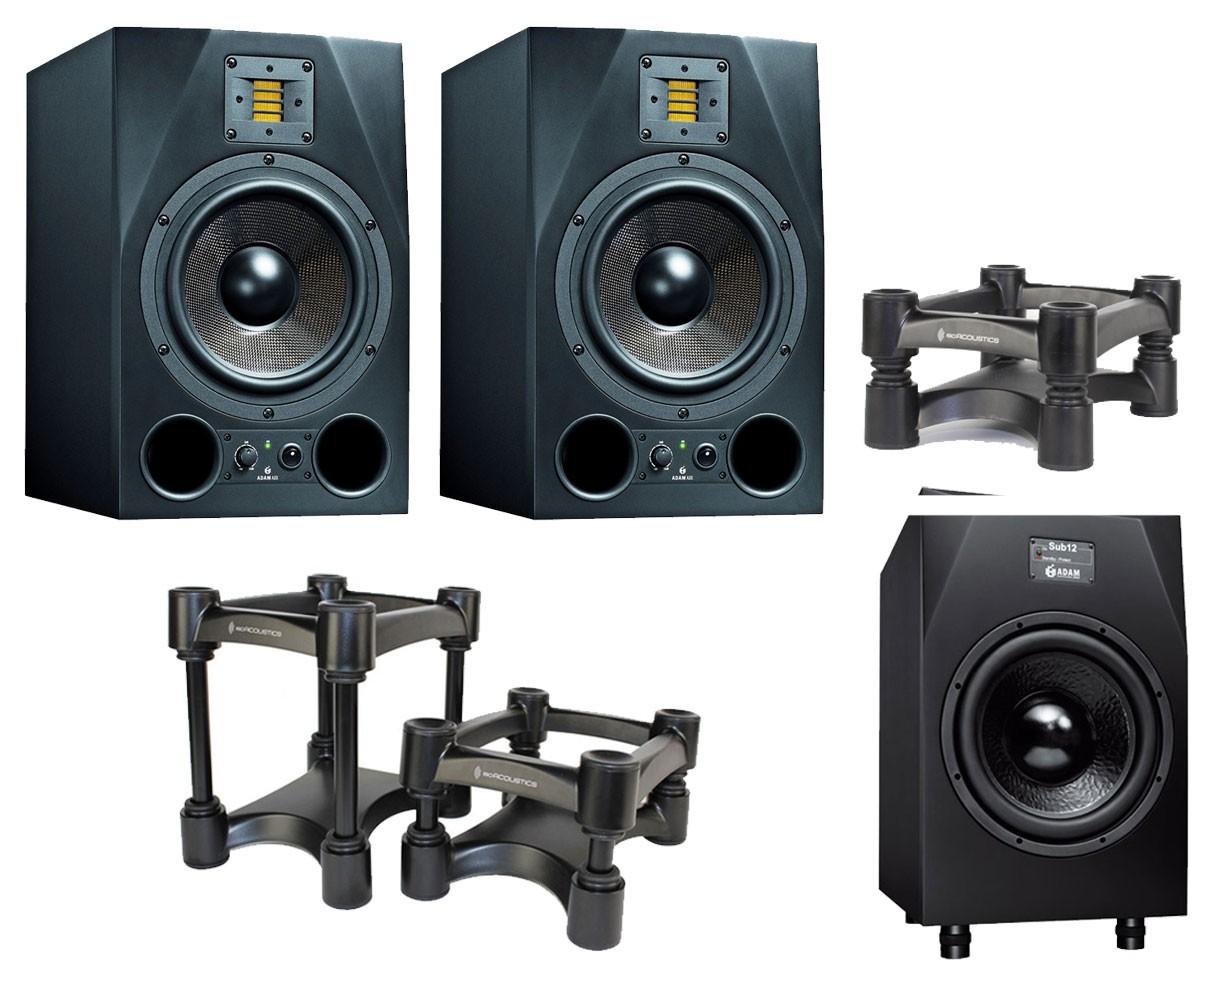 2x ADAM A8X + Sub12 2.1 System + IsoAcoustics